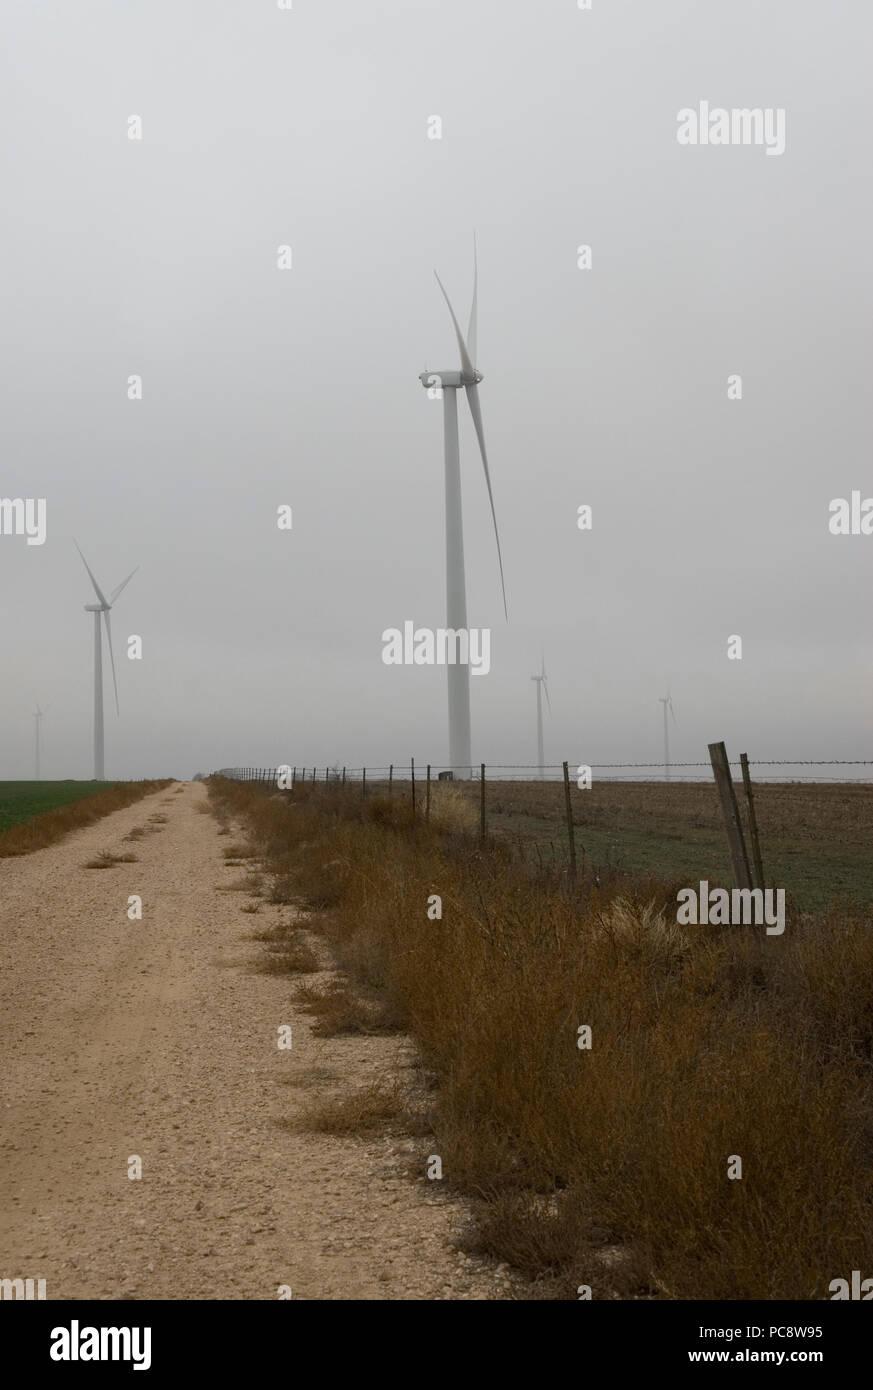 Giant windmills loom in fog near Groom, Texas USA - Stock Image